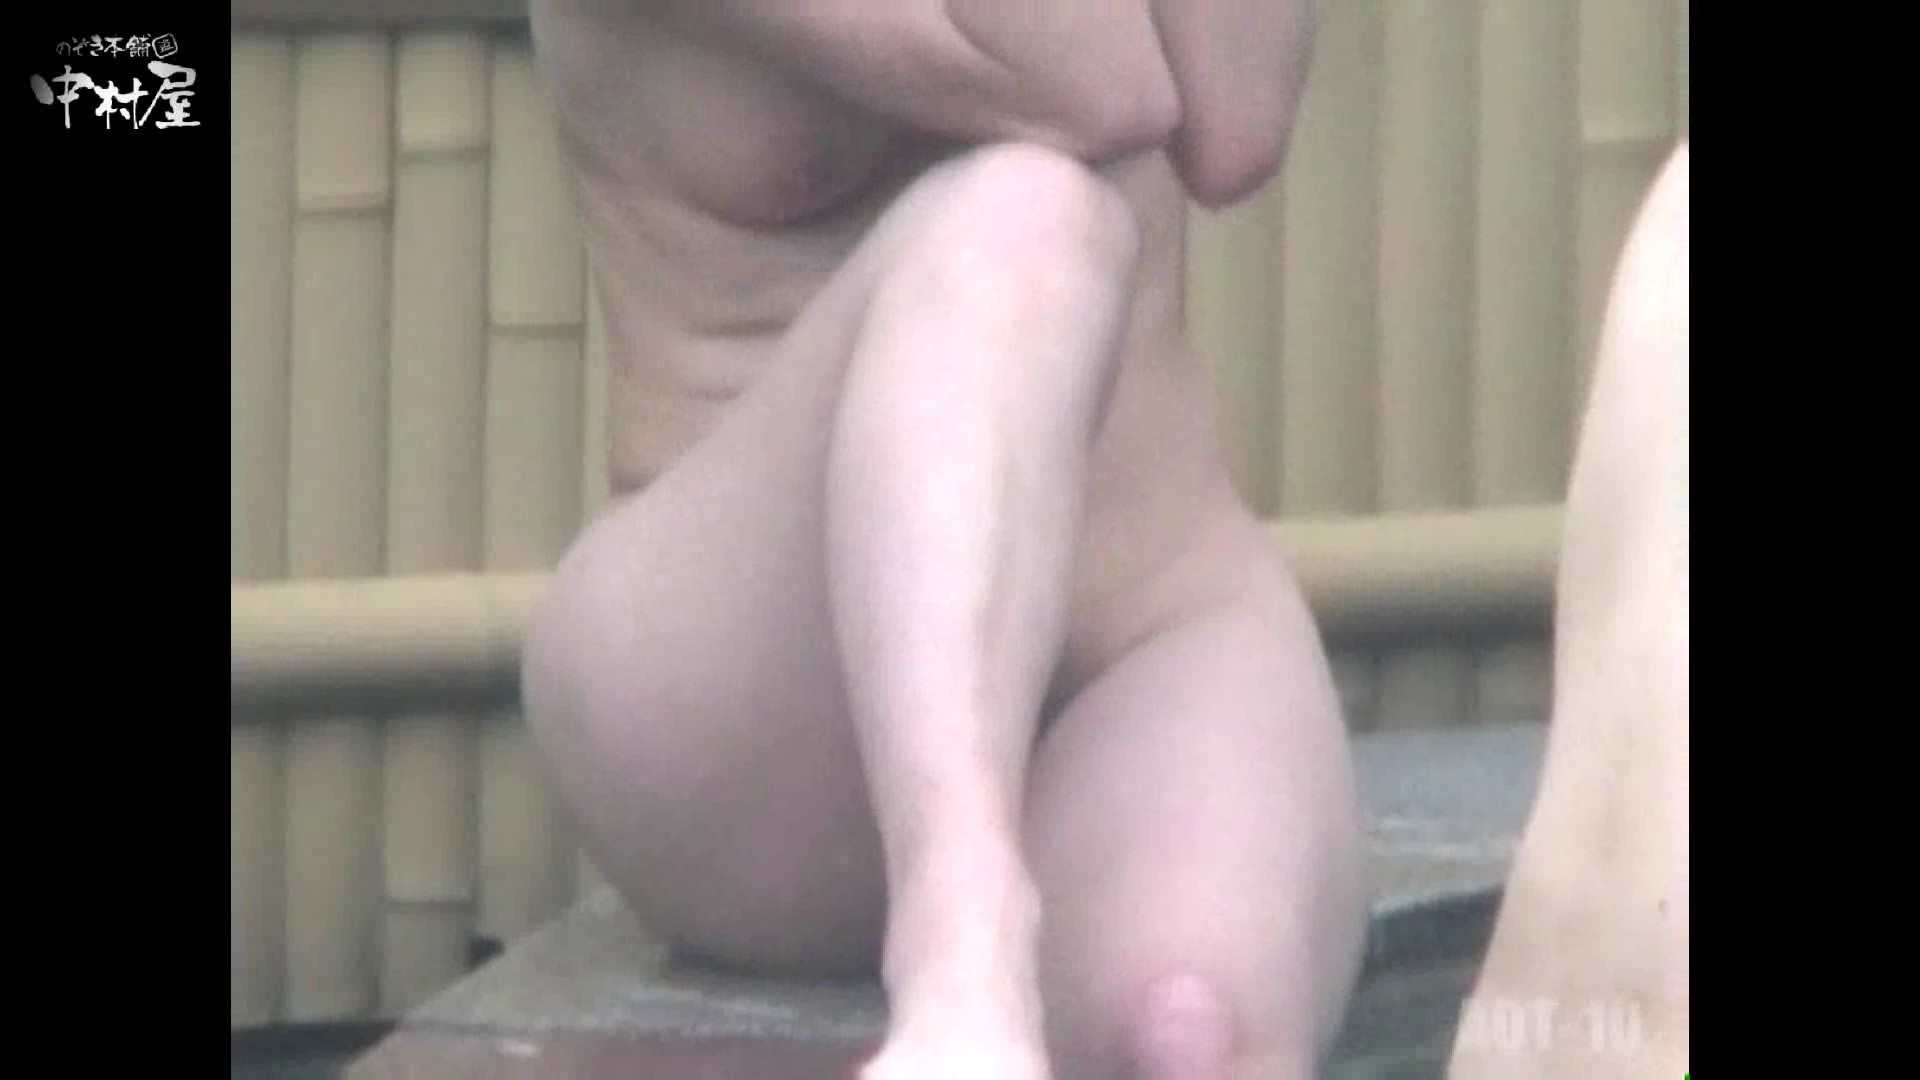 Aquaな露天風呂Vol.874潜入盗撮露天風呂十判湯 其の六 盗撮師作品 | 美しいOLの裸体  79pic 73